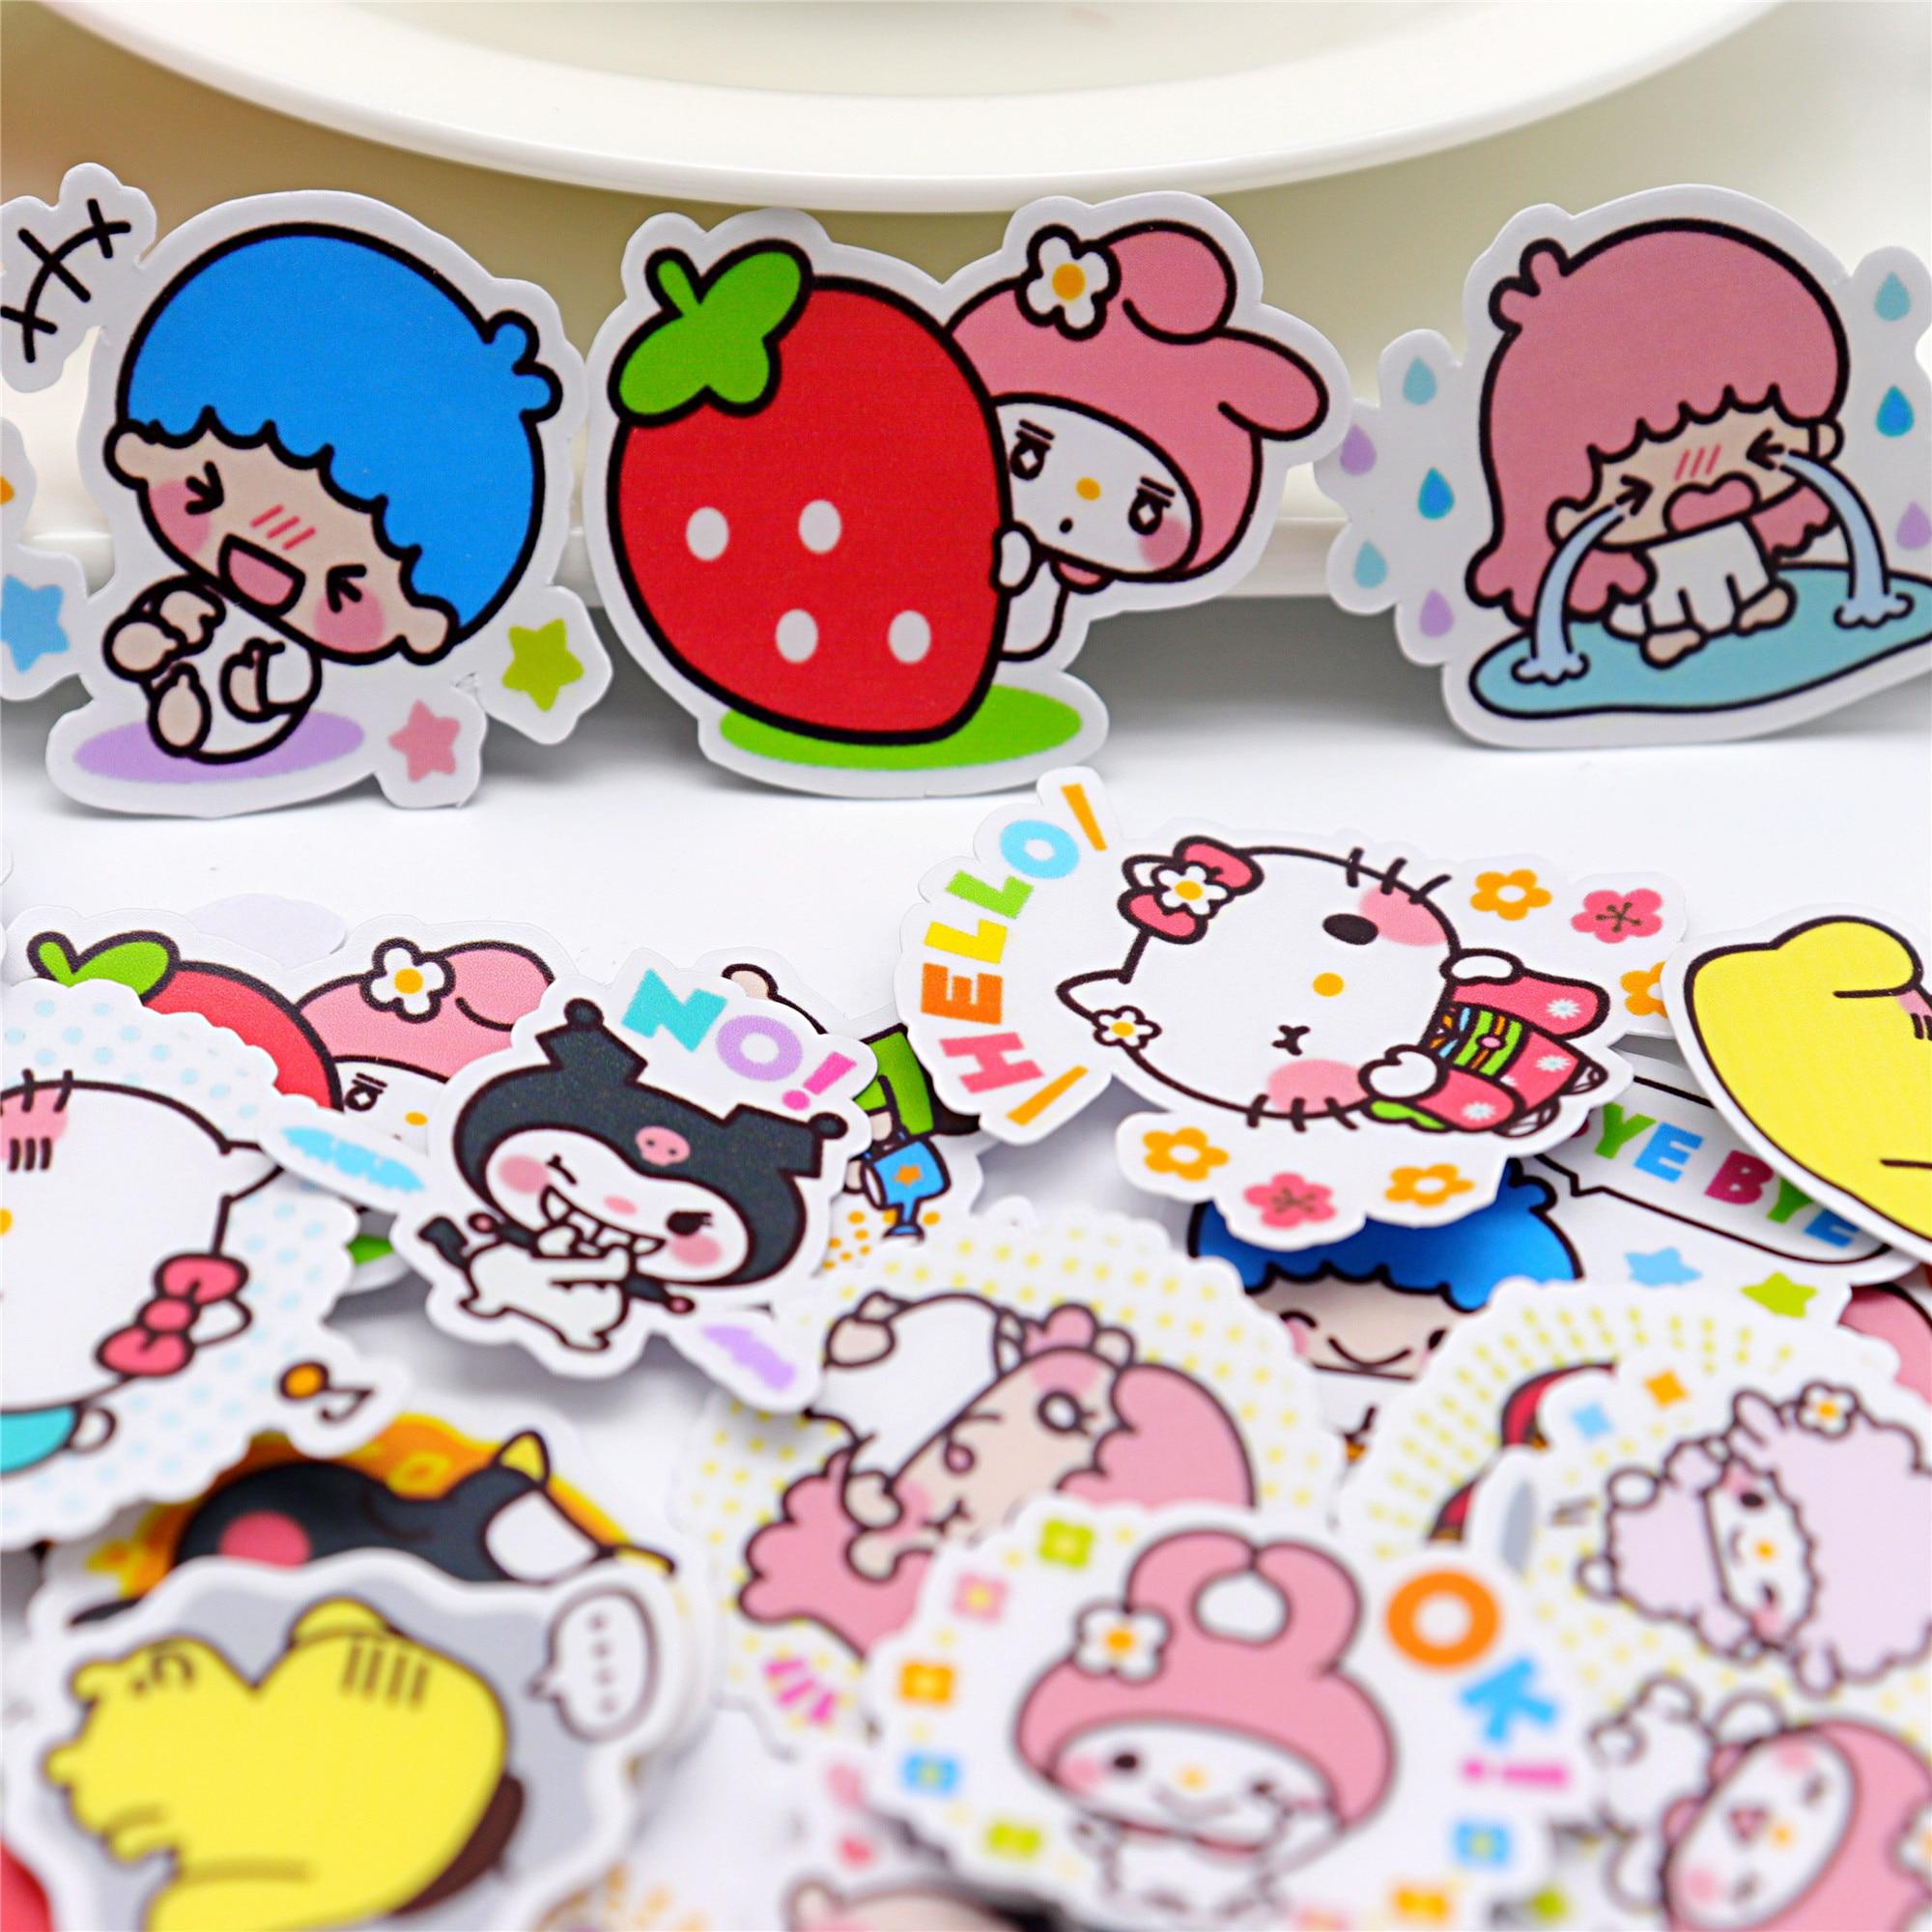 40pcs Creative Kawaii Self-made Love  Girl Stickers Beautiful Stickers /decorative Sticker /DIY Craft Photo Albums